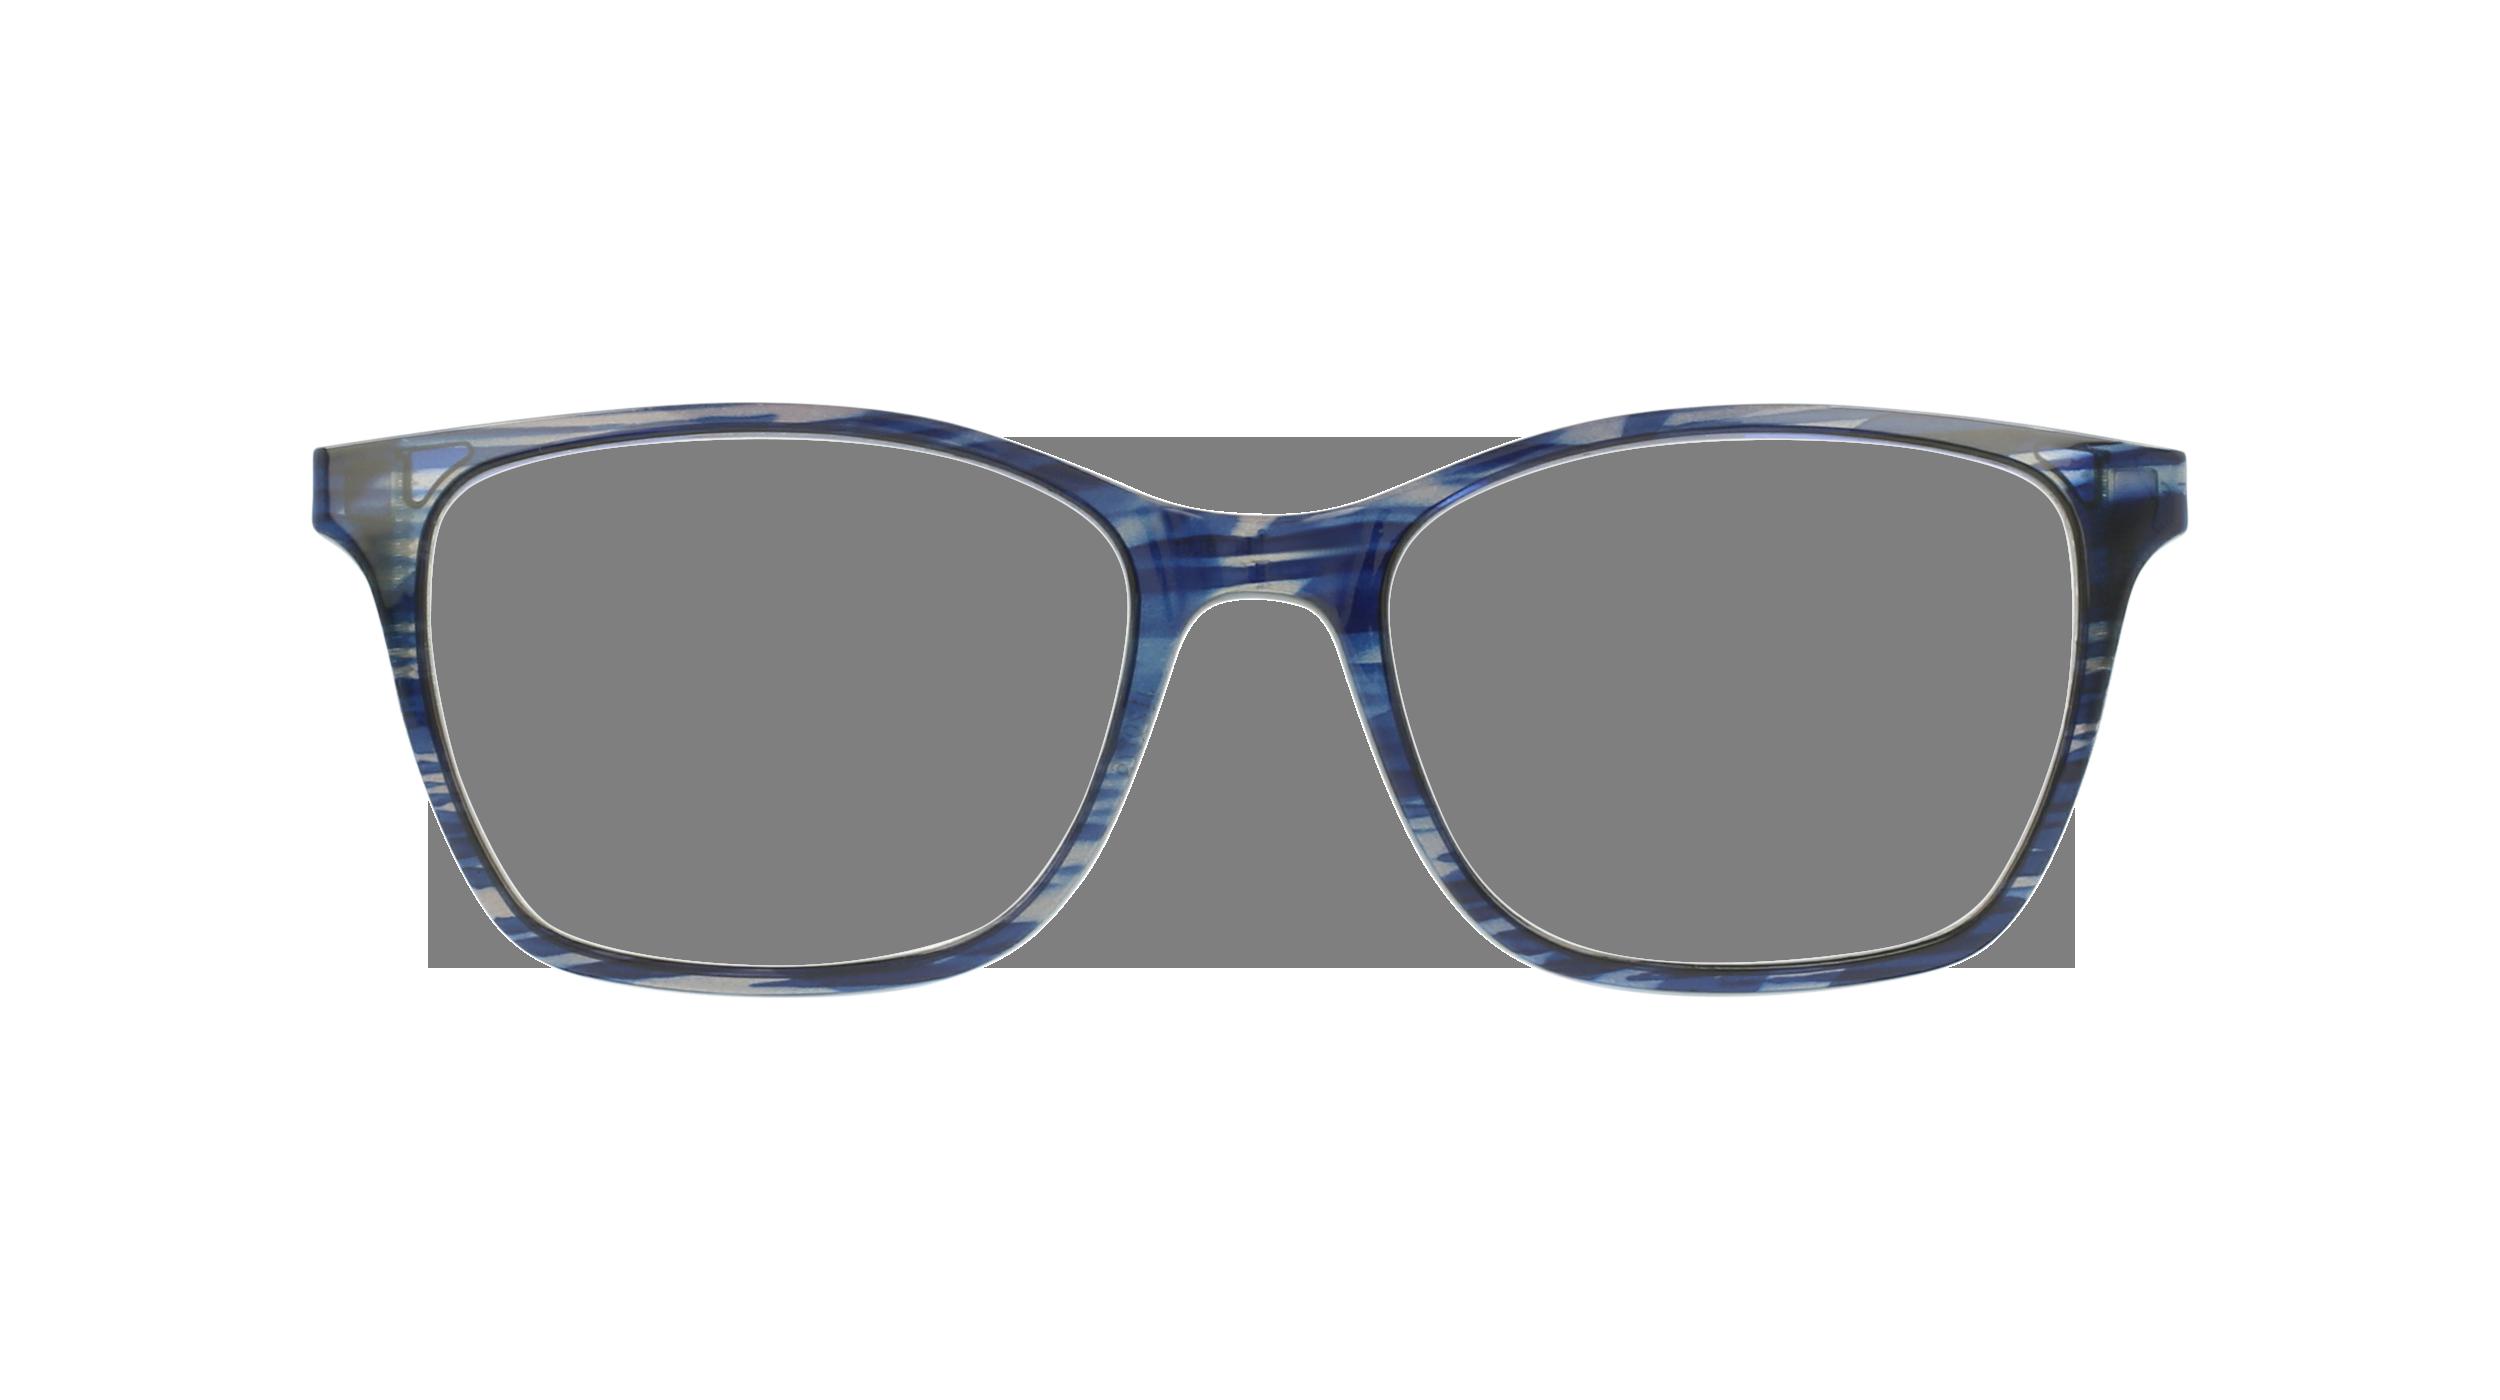 afflelou/france/products/smart_clip/clips_glasses/07630036457597.png